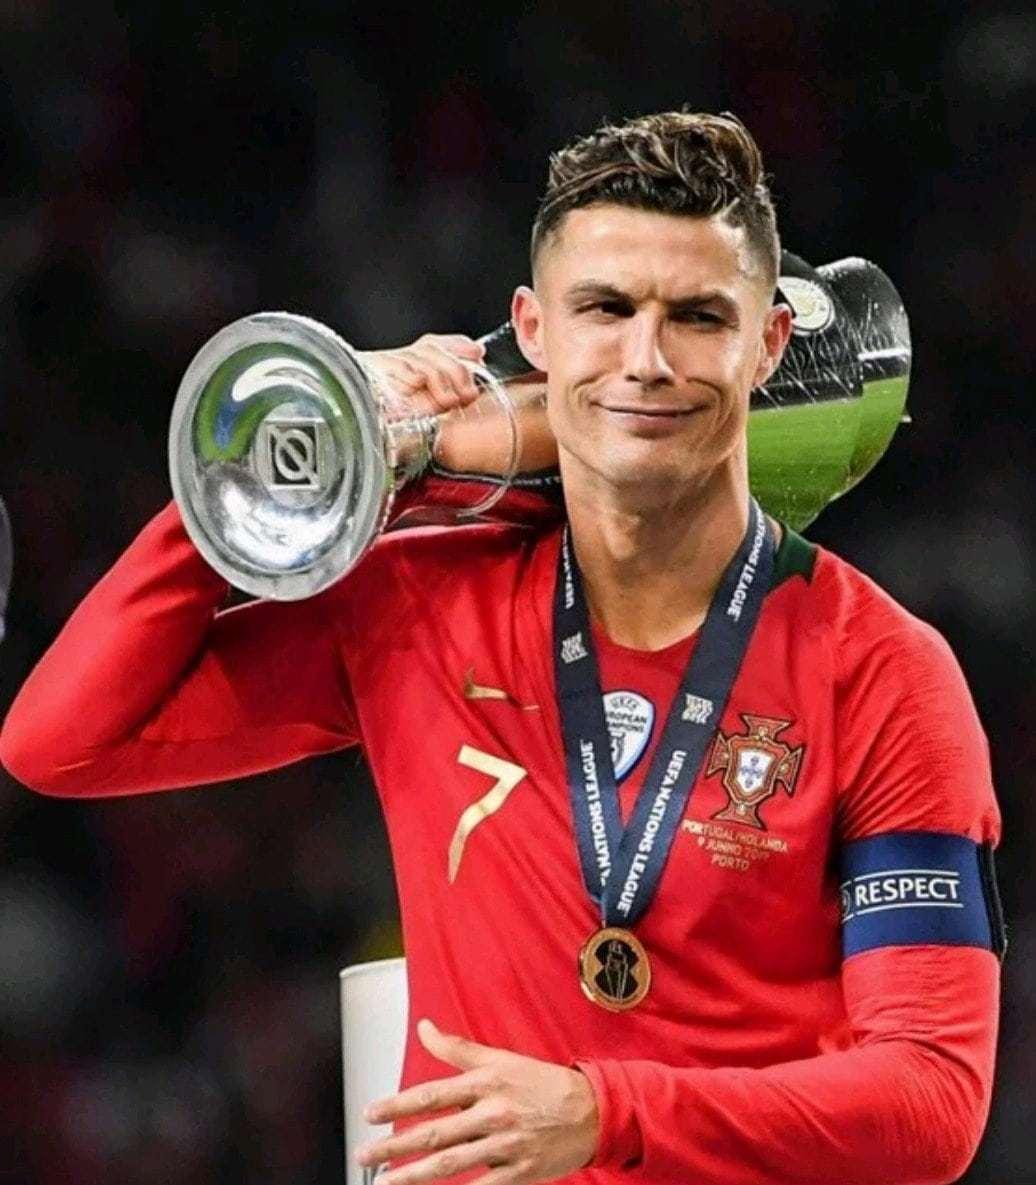 Ronaldo lifts UEFA Nations League cup, his second ...